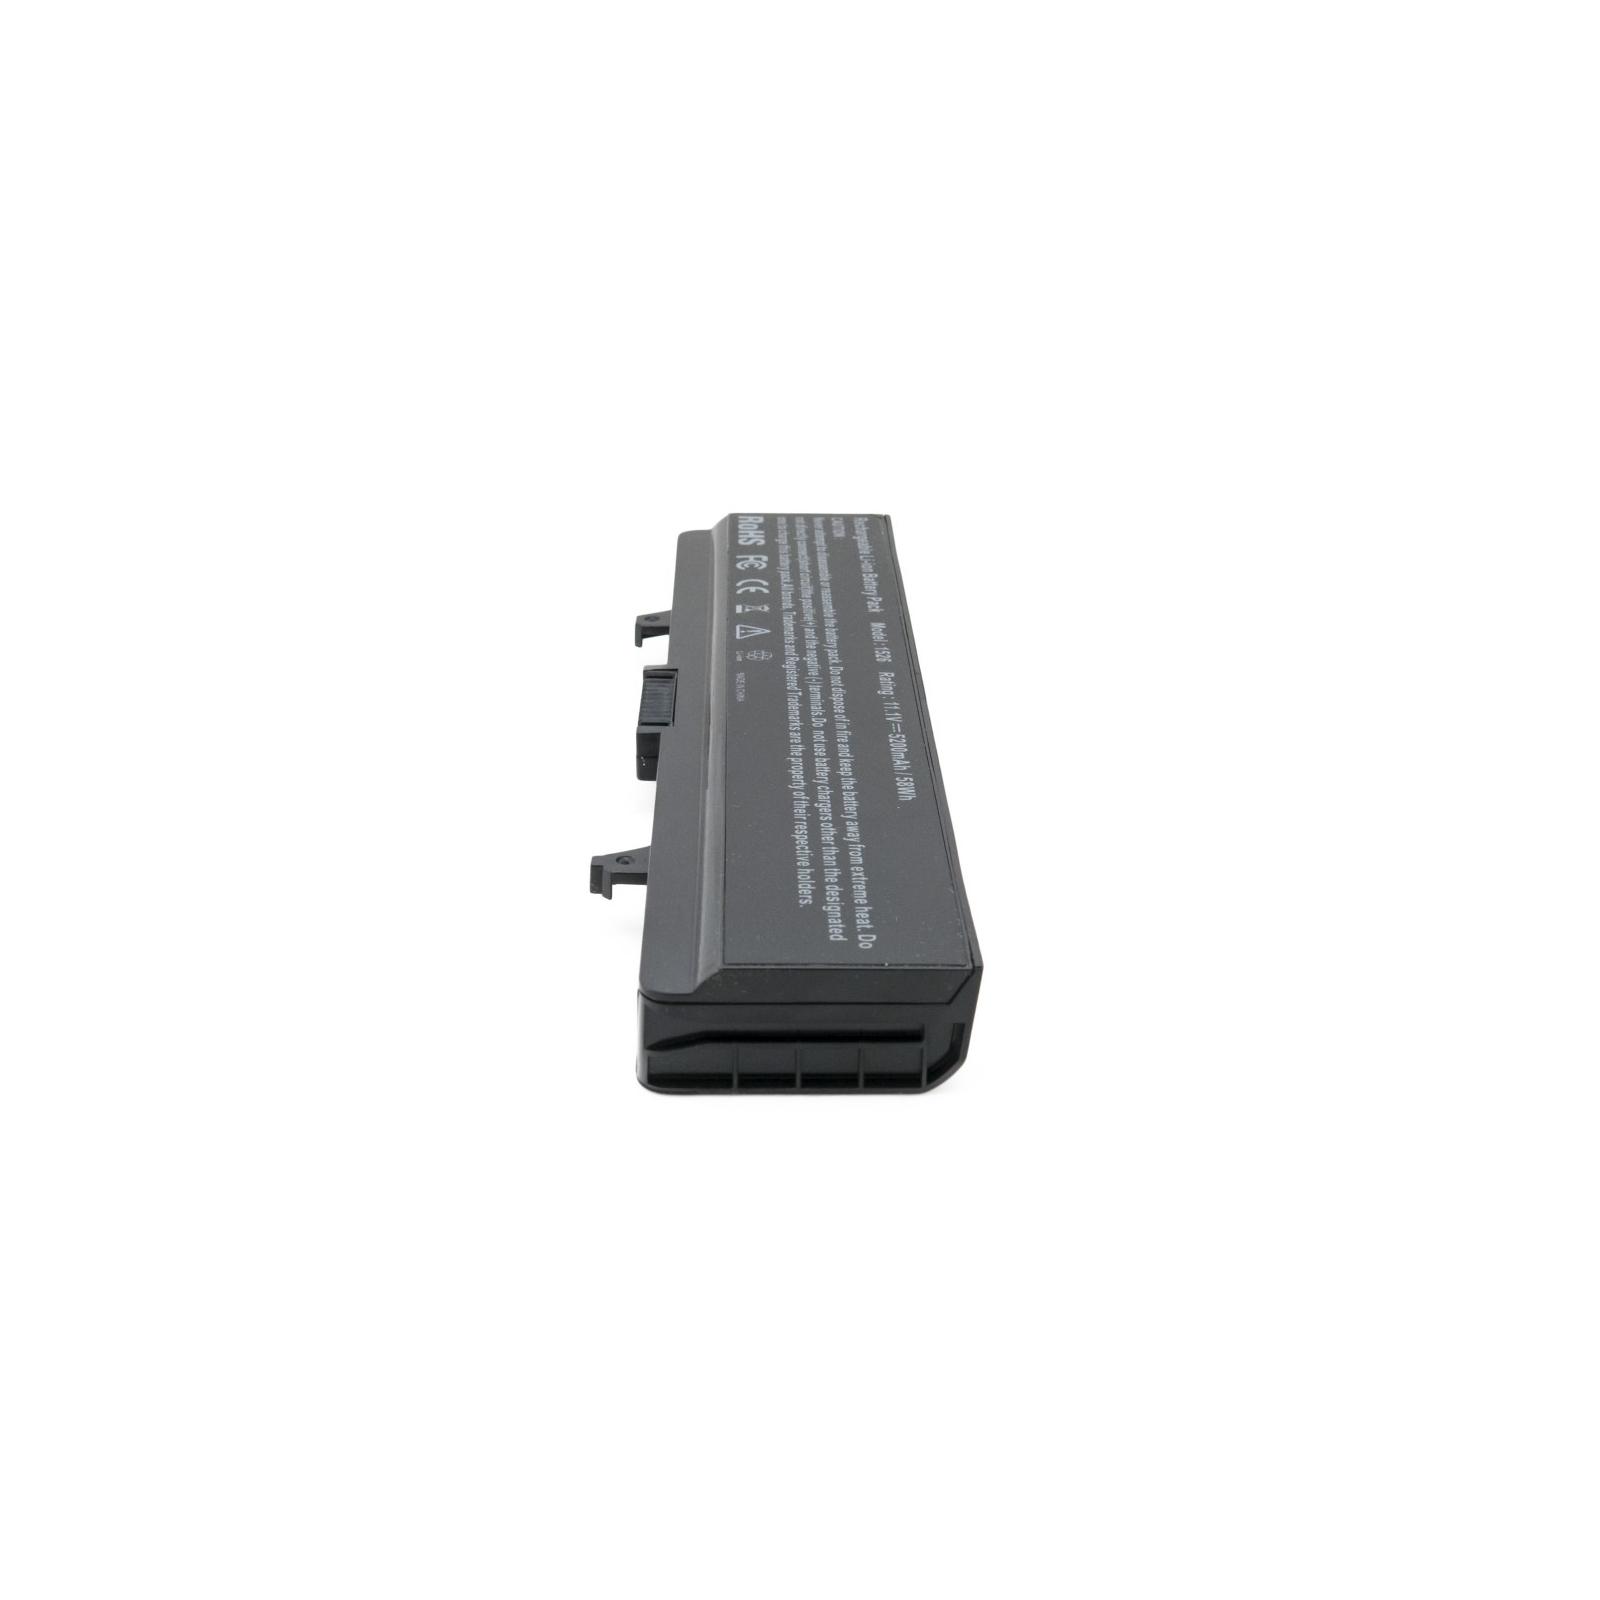 Аккумулятор для ноутбука Dell Inspiron 1526, 5200 mAh EXTRADIGITAL (BND3929) изображение 5